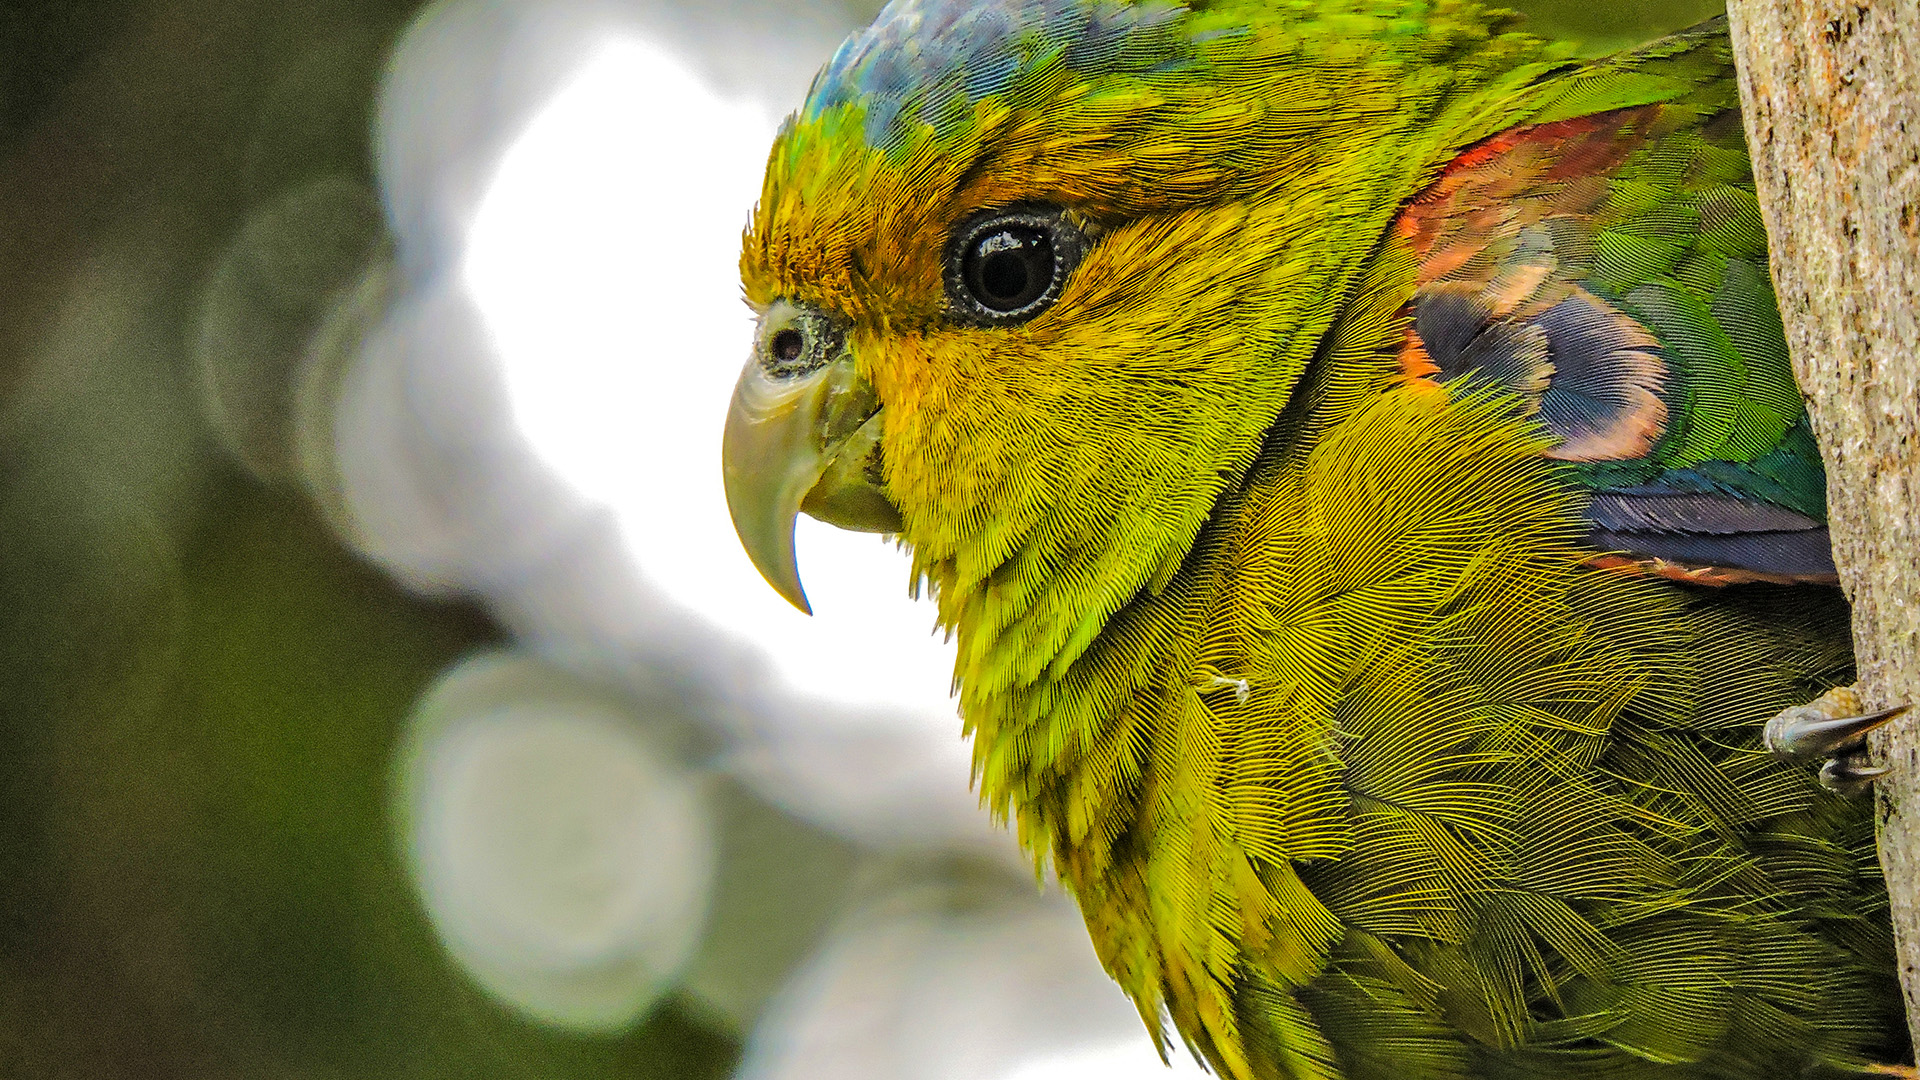 Birding and Harping